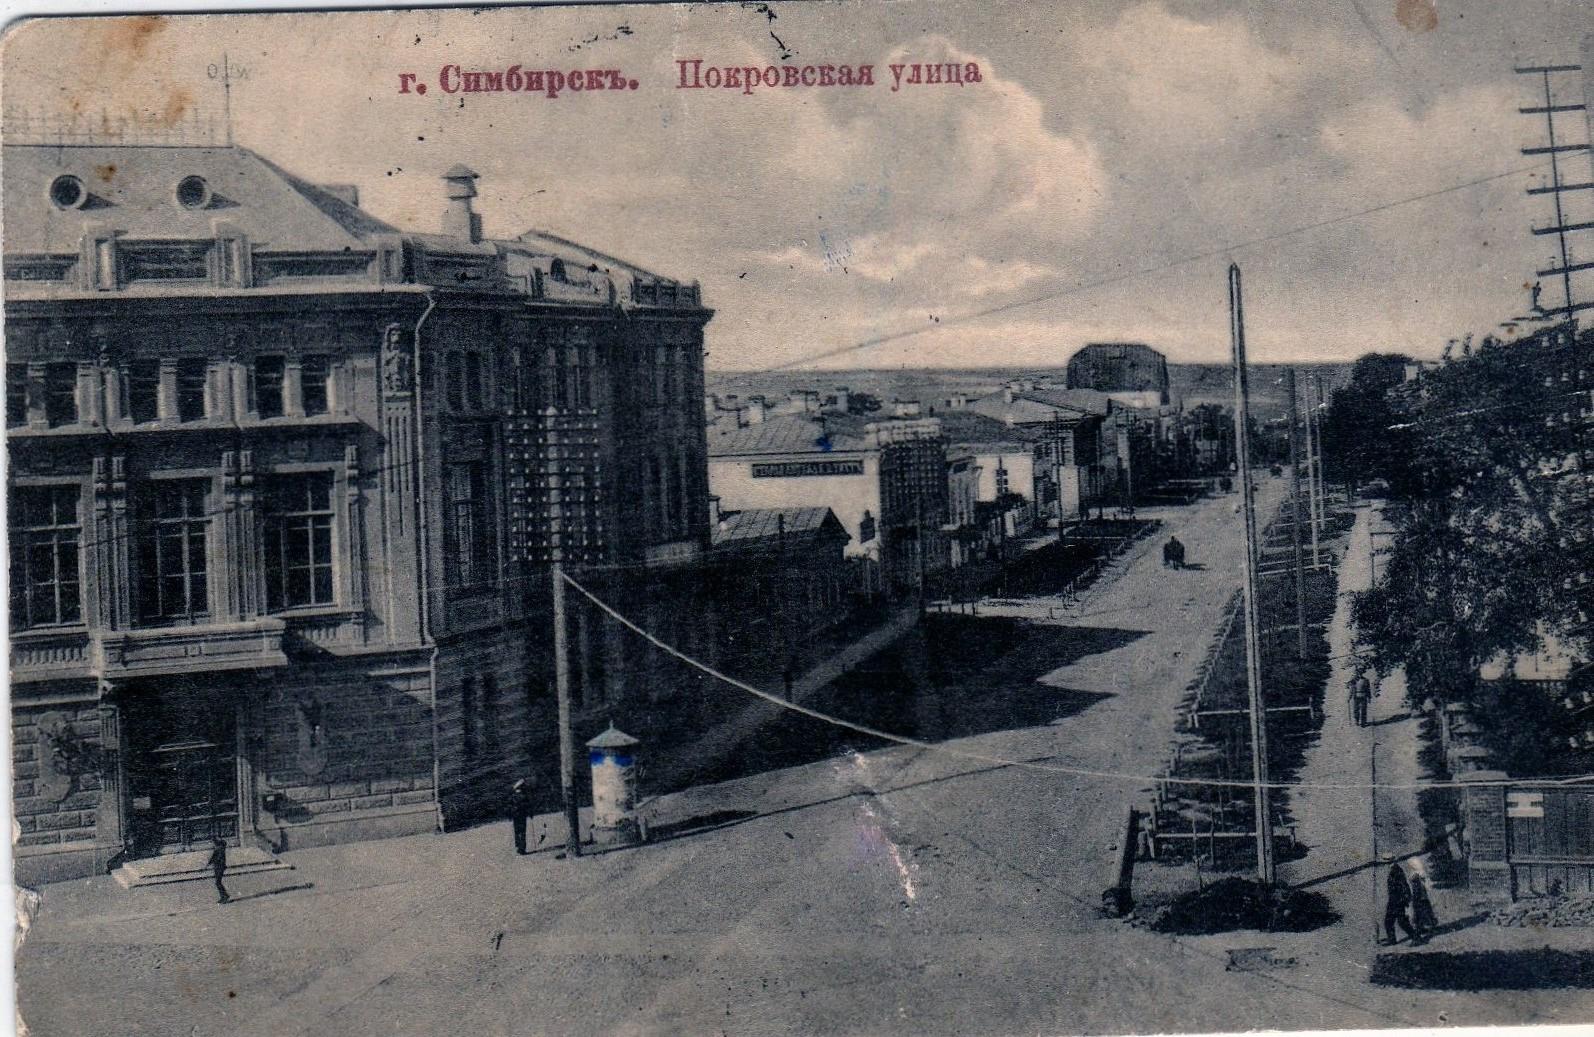 Покровская улица. Земская Управа